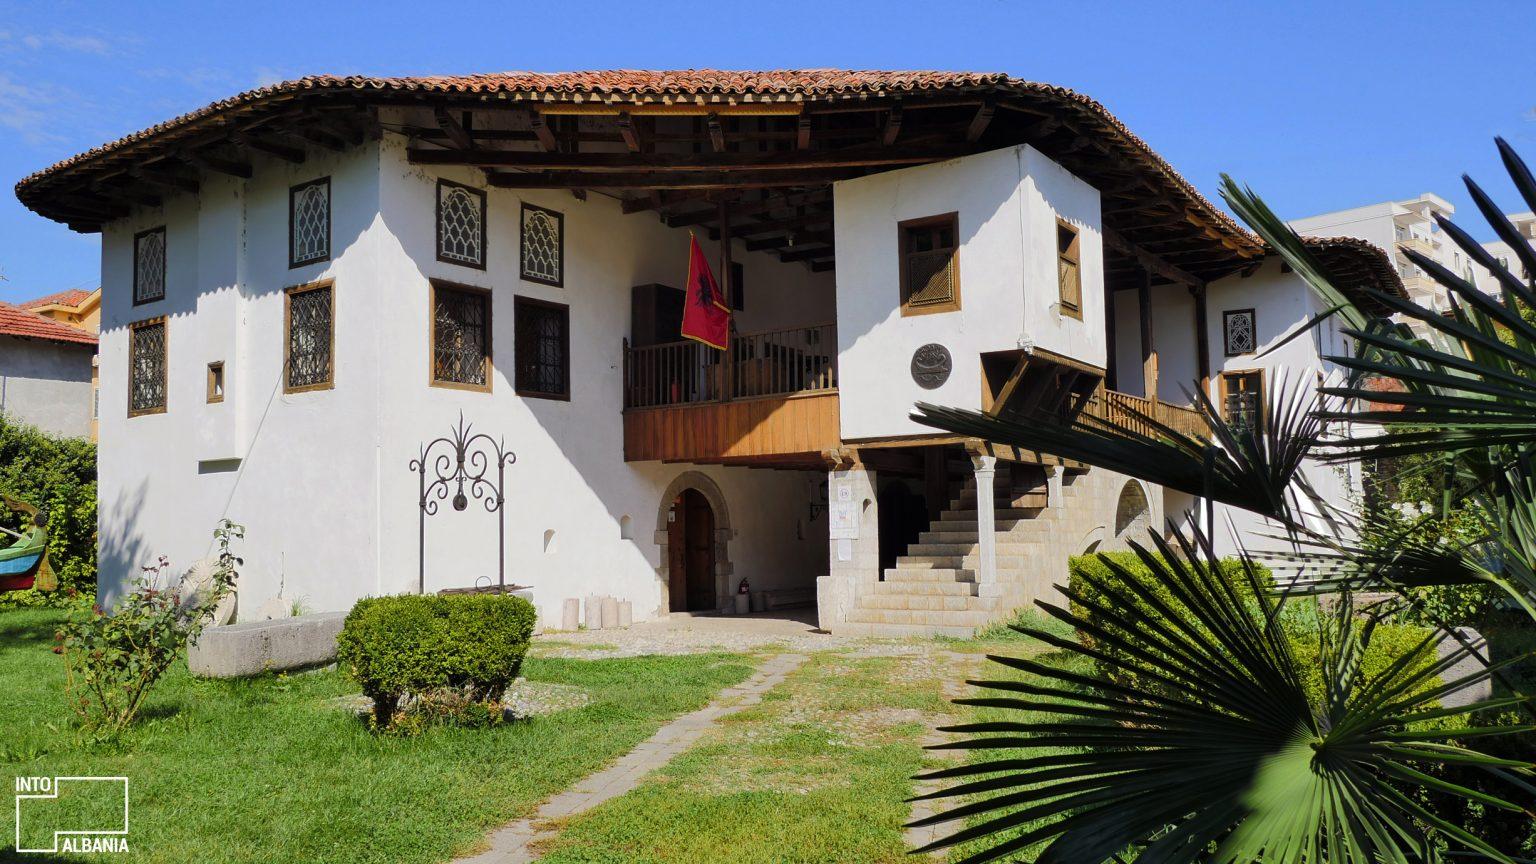 House of Oso Kuka, Shkodra, photo by IntoAlbania